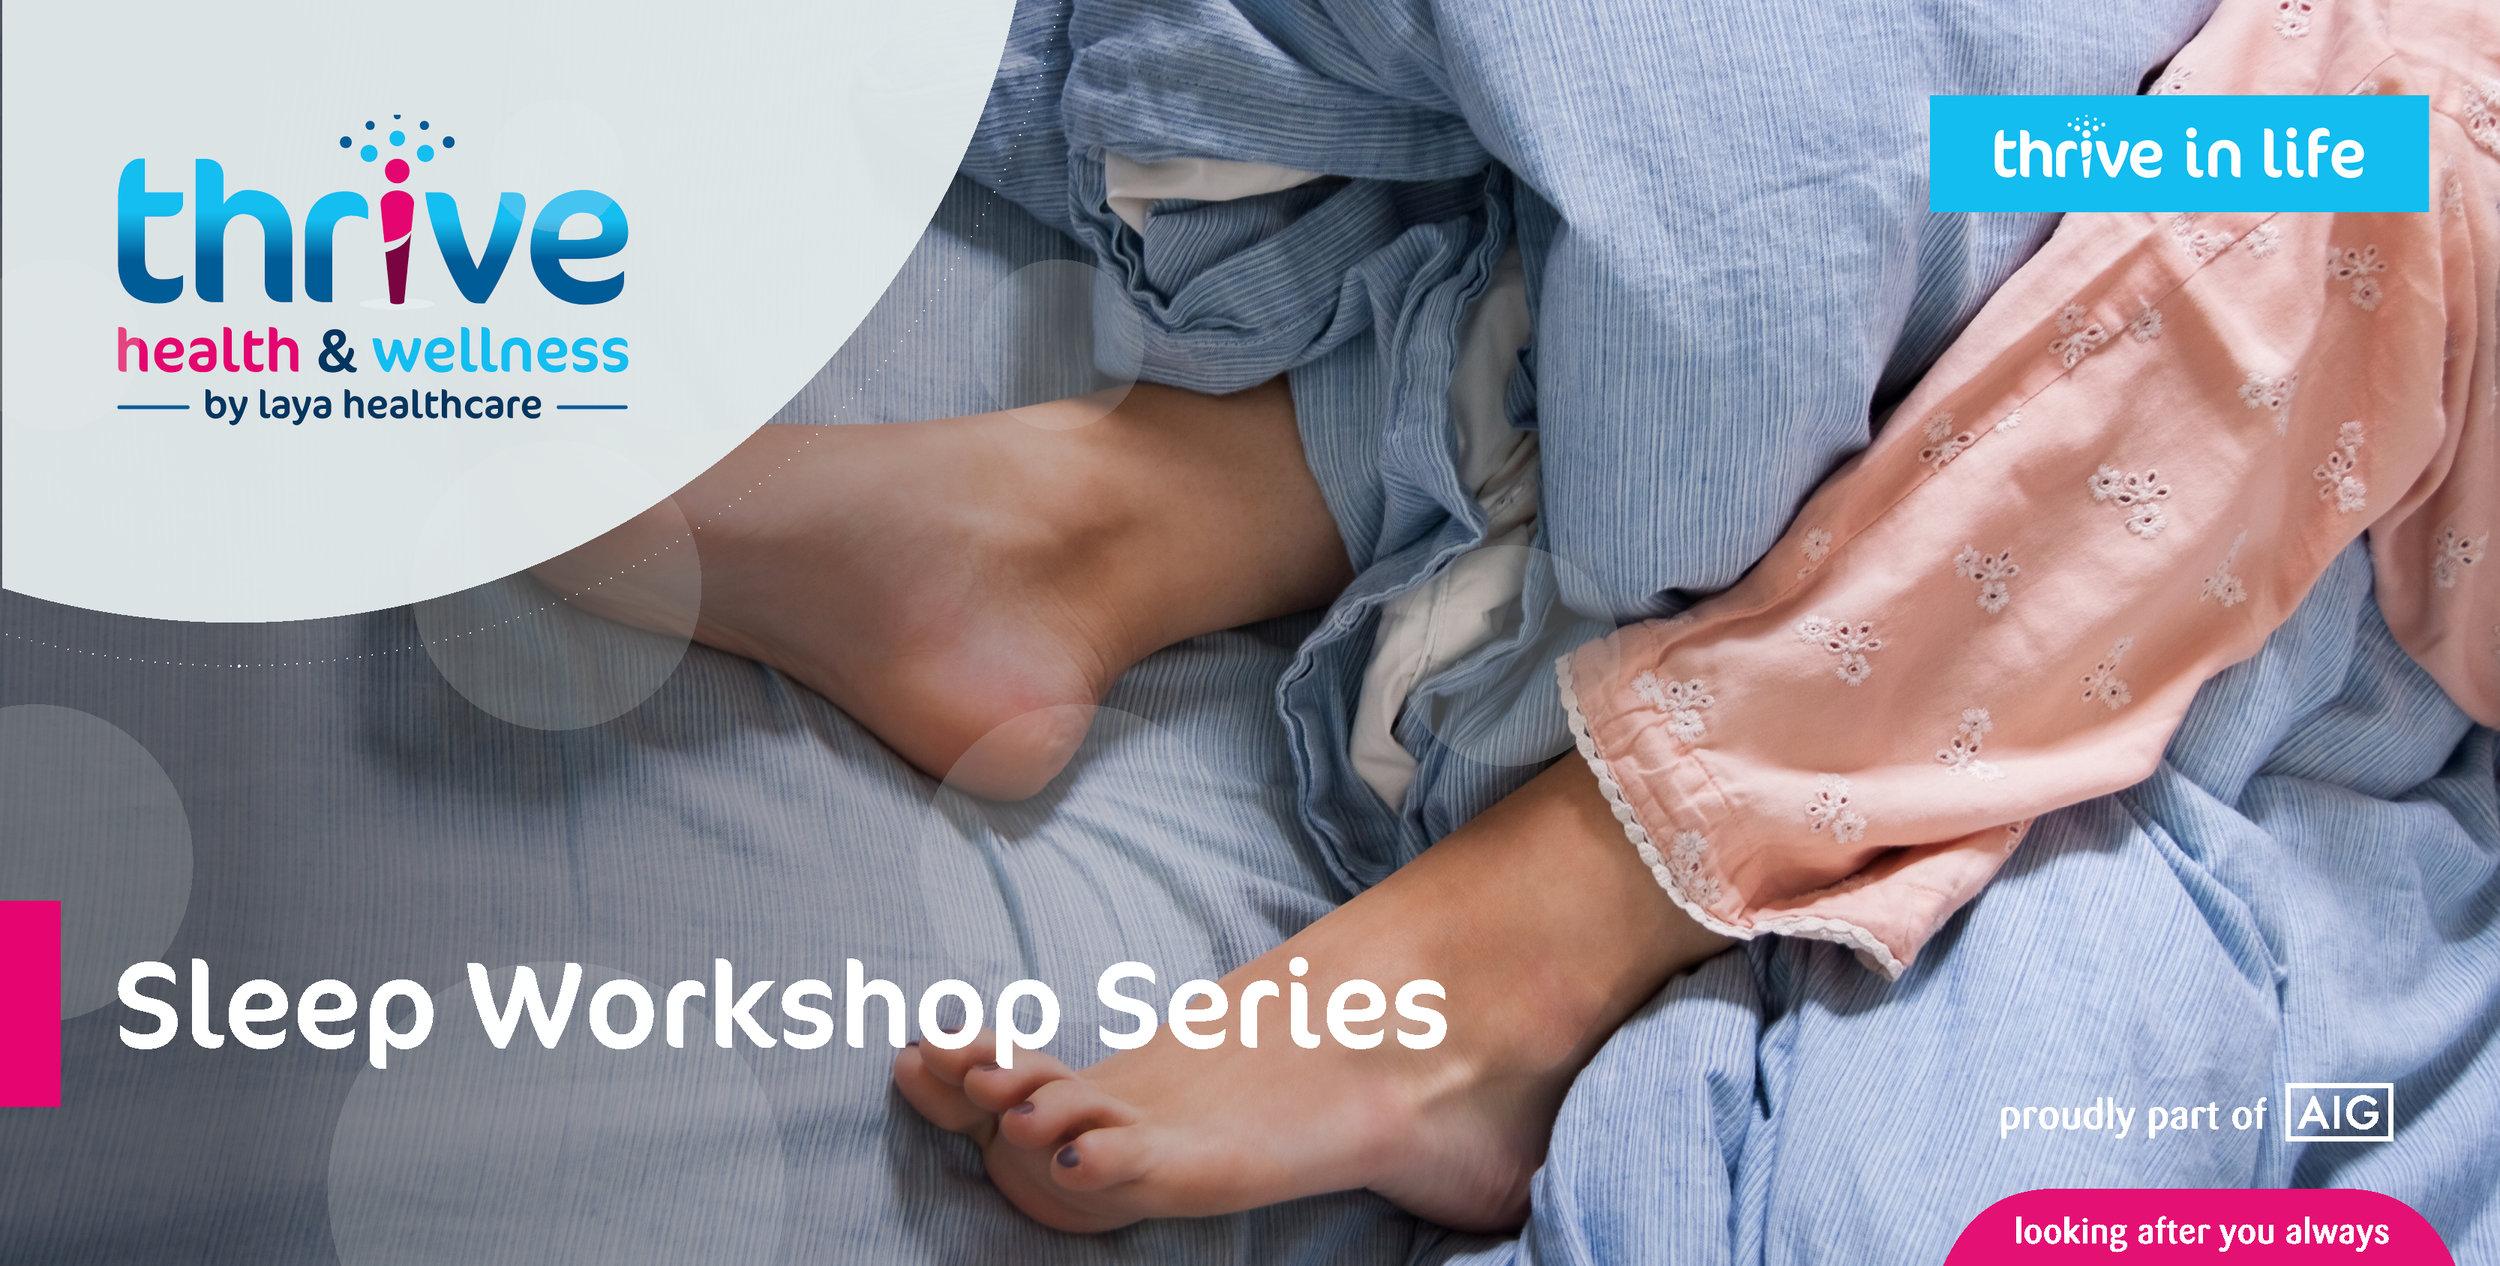 MAILCHIMP TEMPLATE. Sleep Workshop Series.jpg